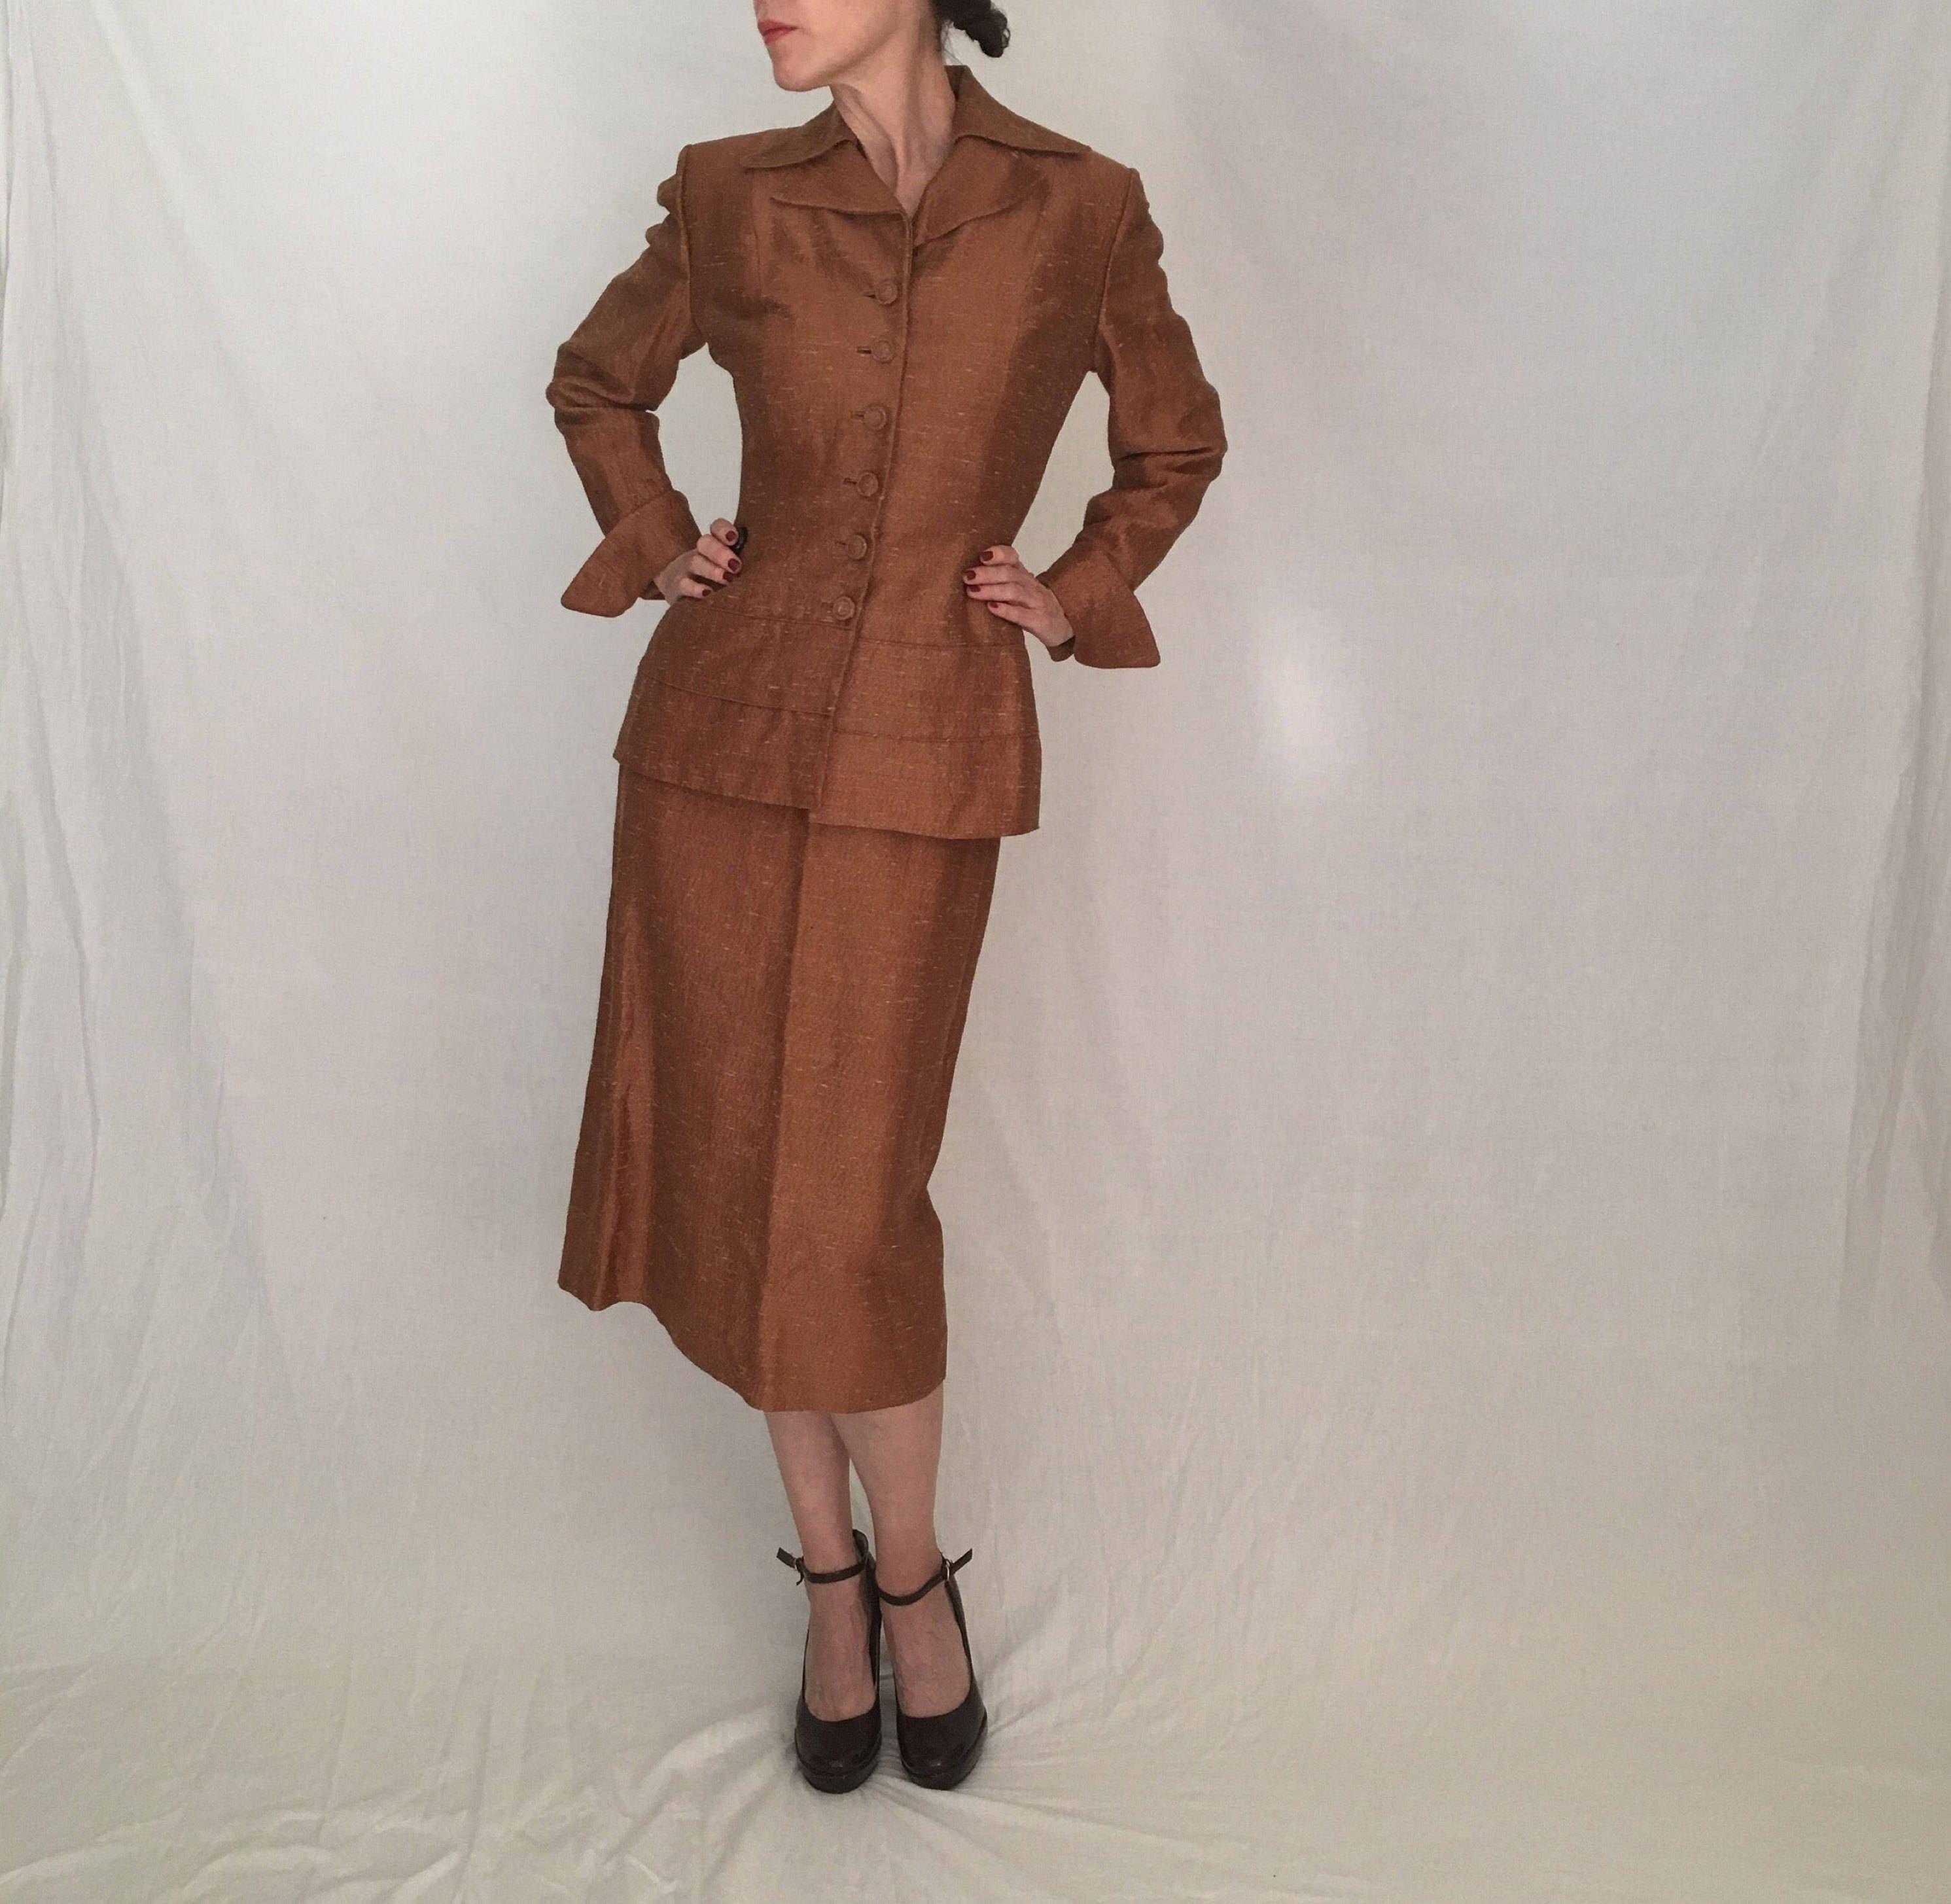 Vintage Lilli Ann 1940s 1950s Suit Women Small Xs 2 4 Brown Beige